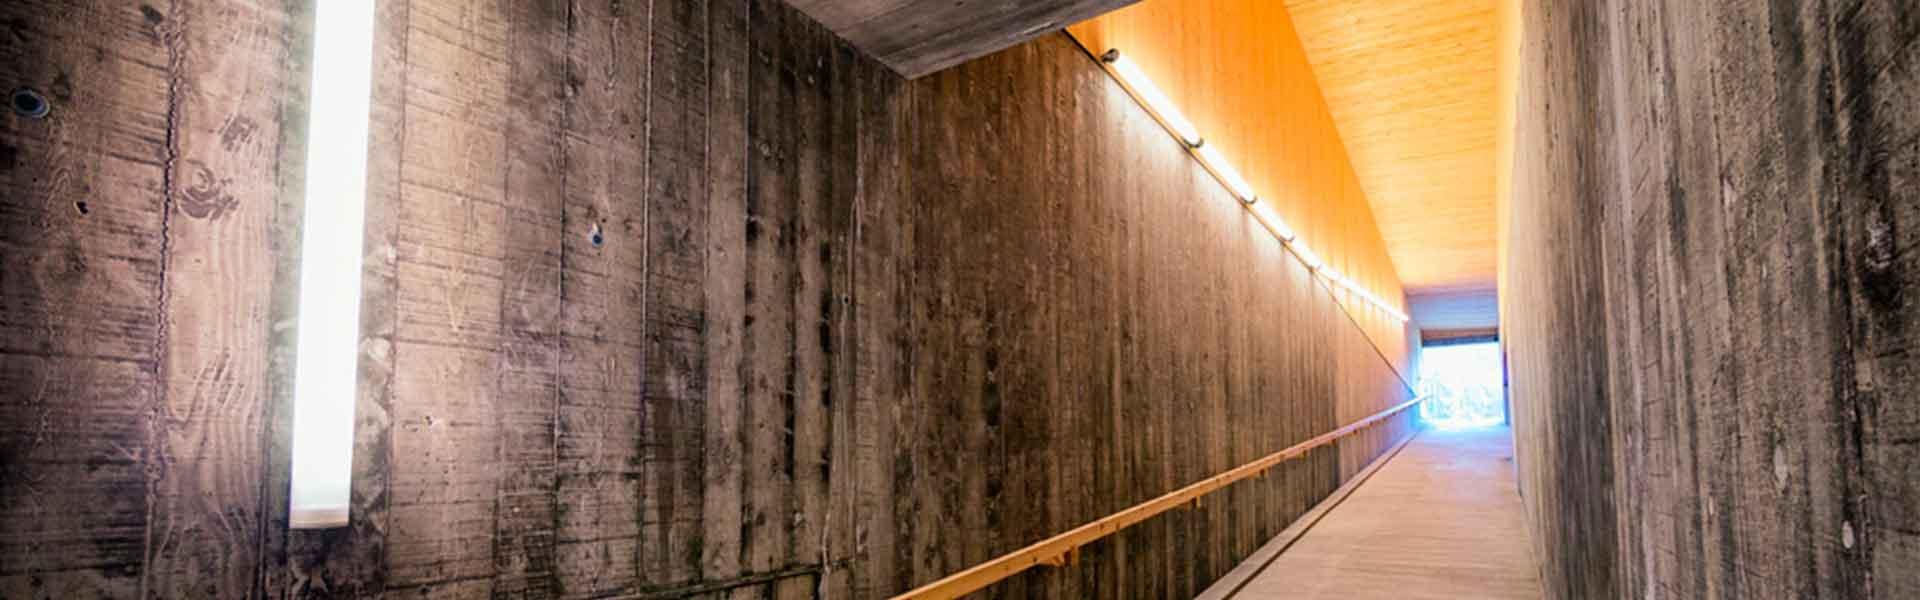 Programa de actualización en Iluminación - Facultad de Arquitectura